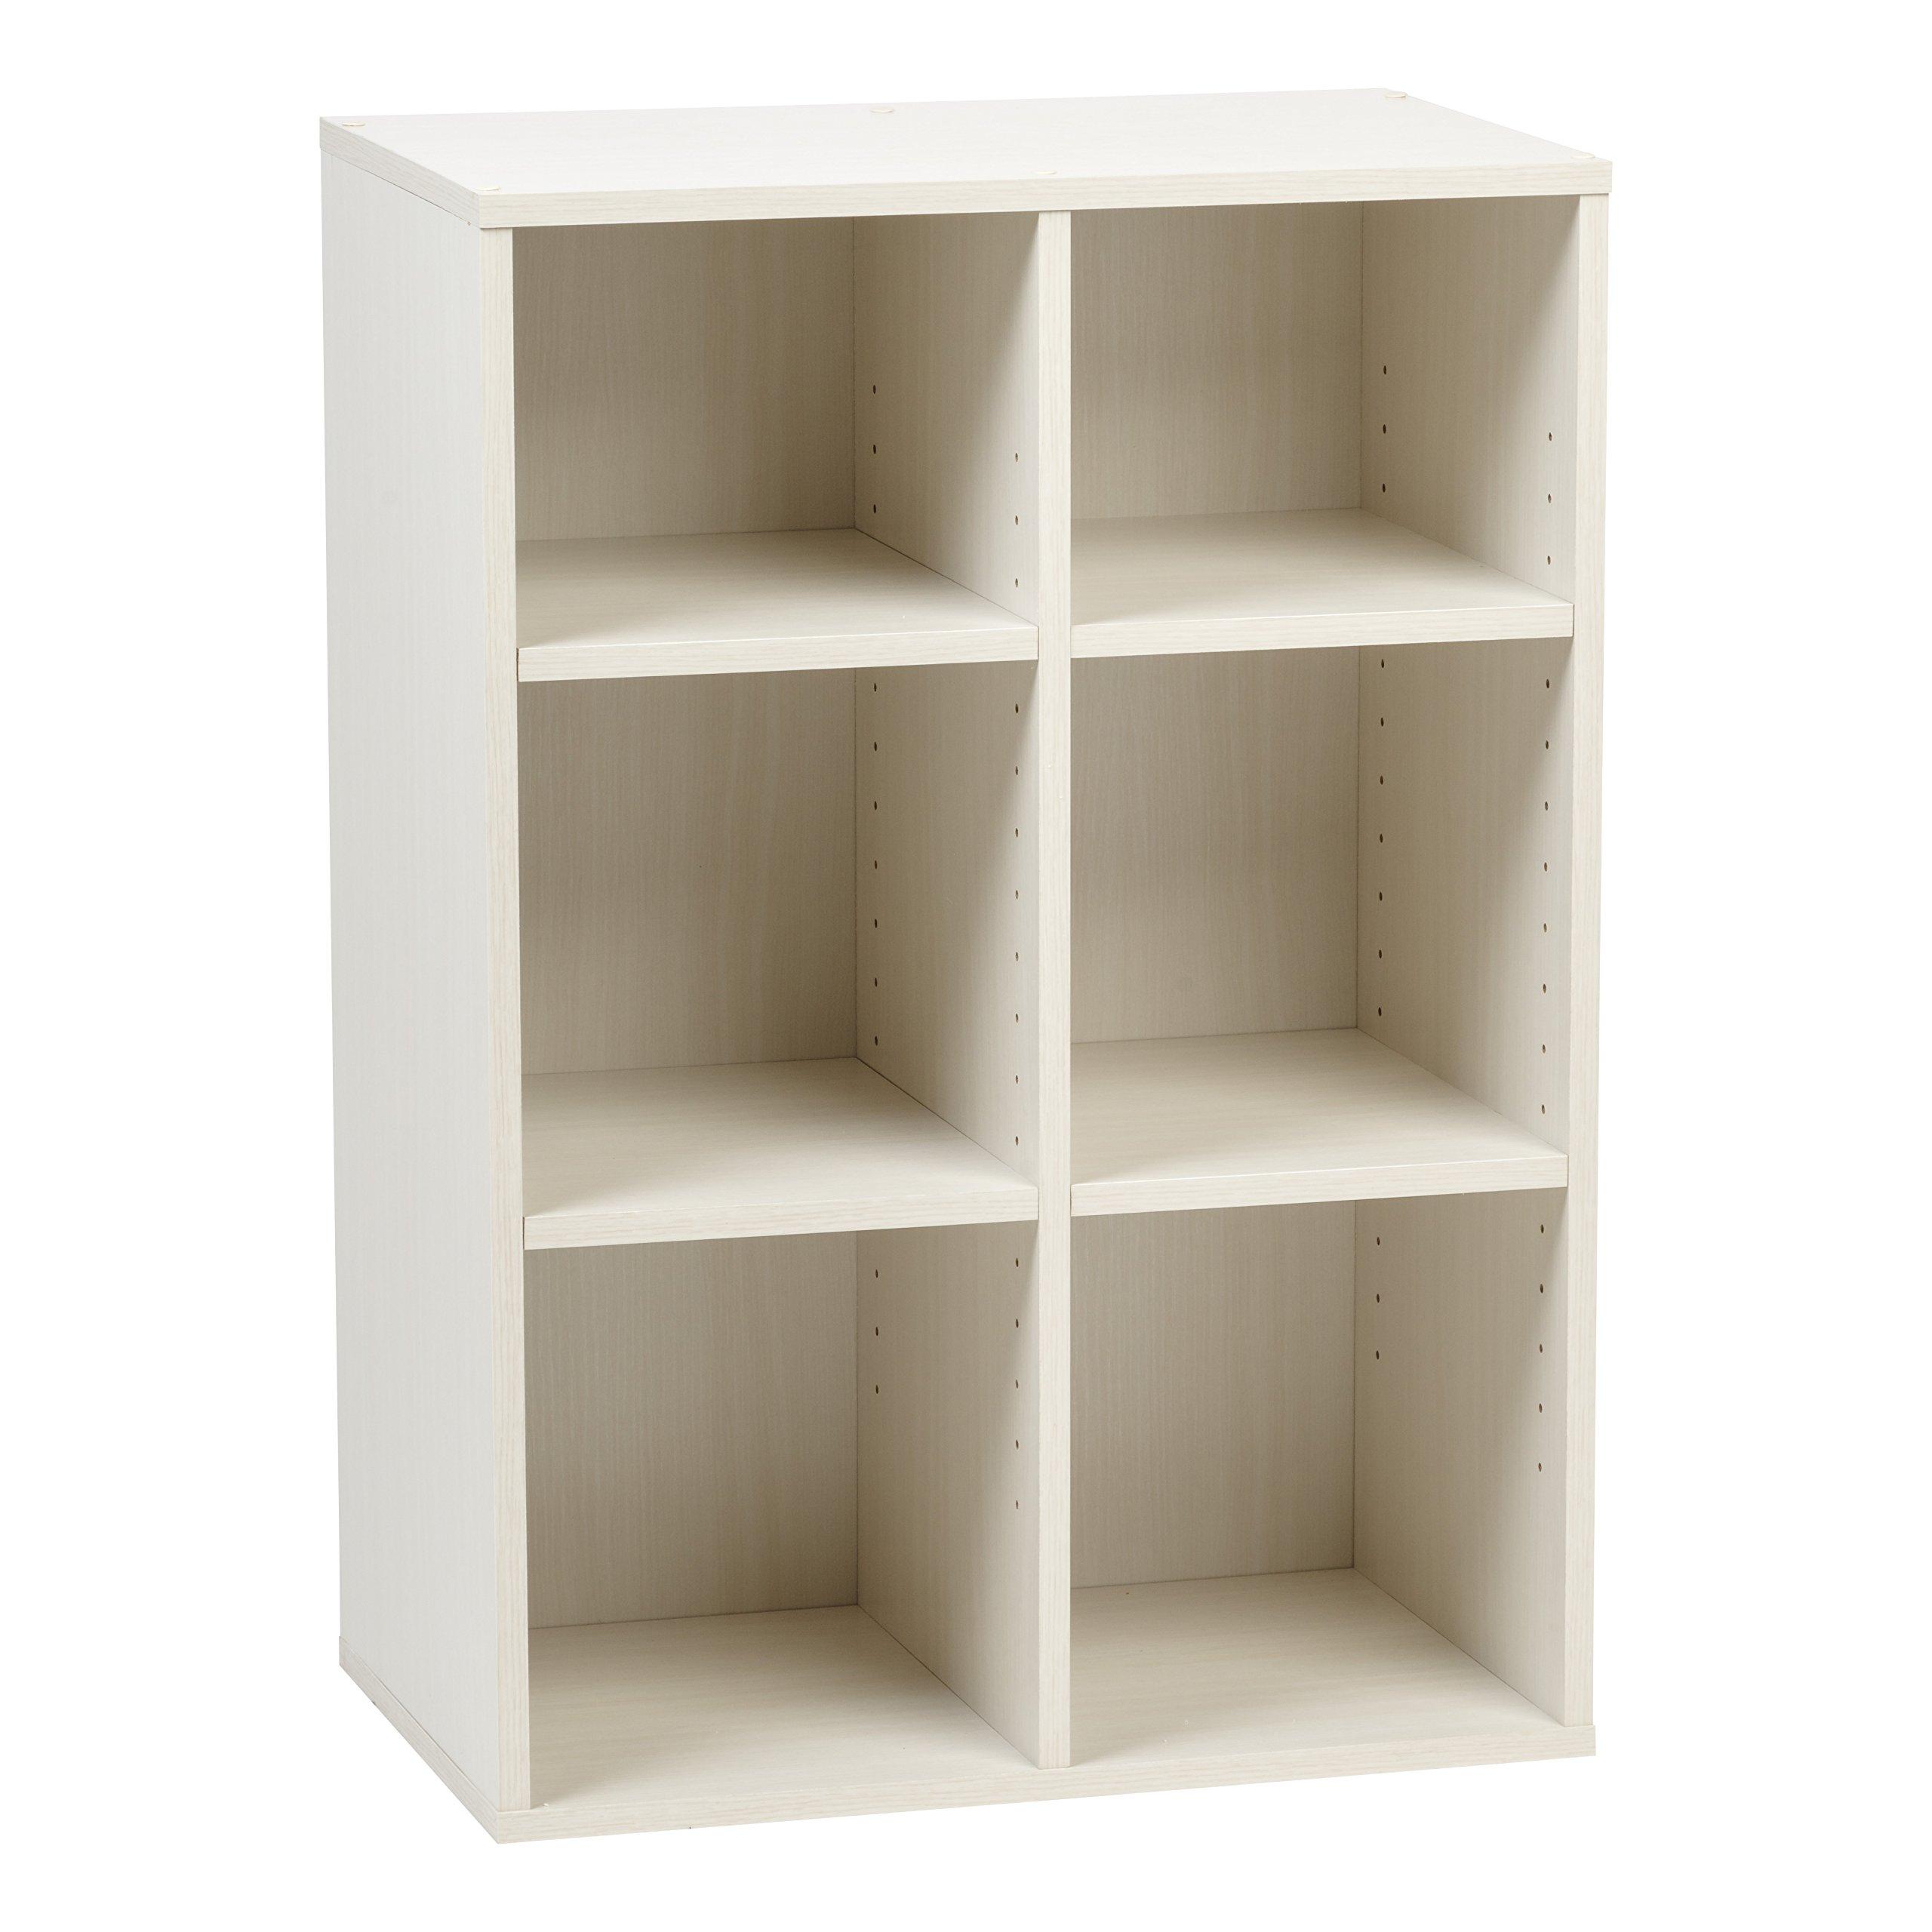 IRIS USA 596332 Wood Shelf, Queen, Off White